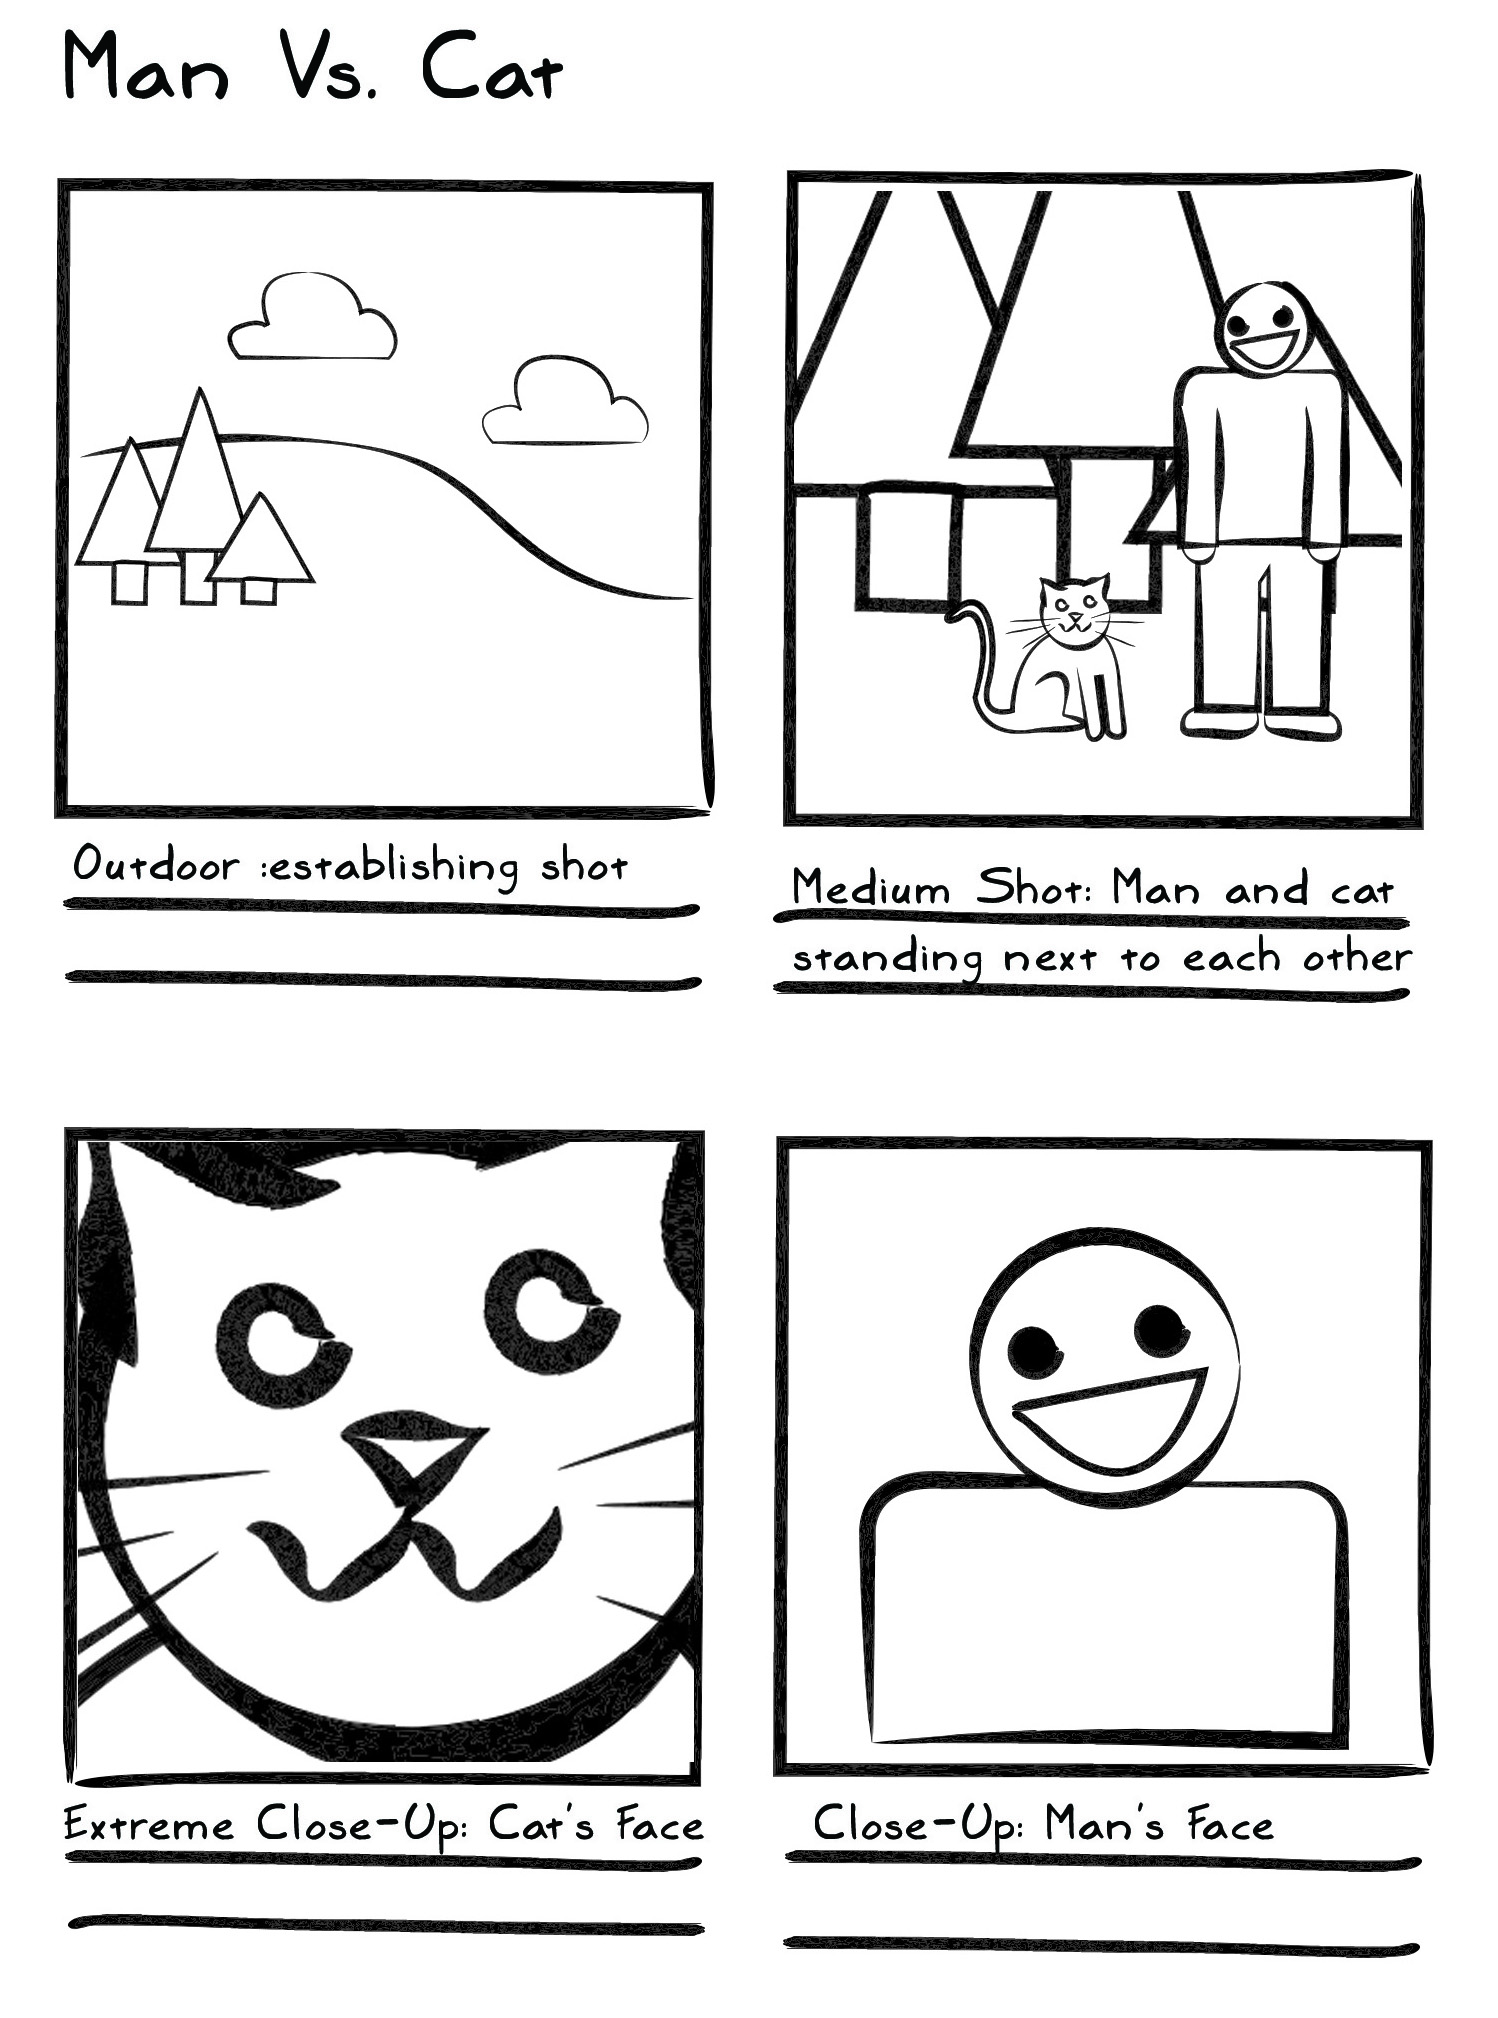 Man vs Cat Example Storyboard